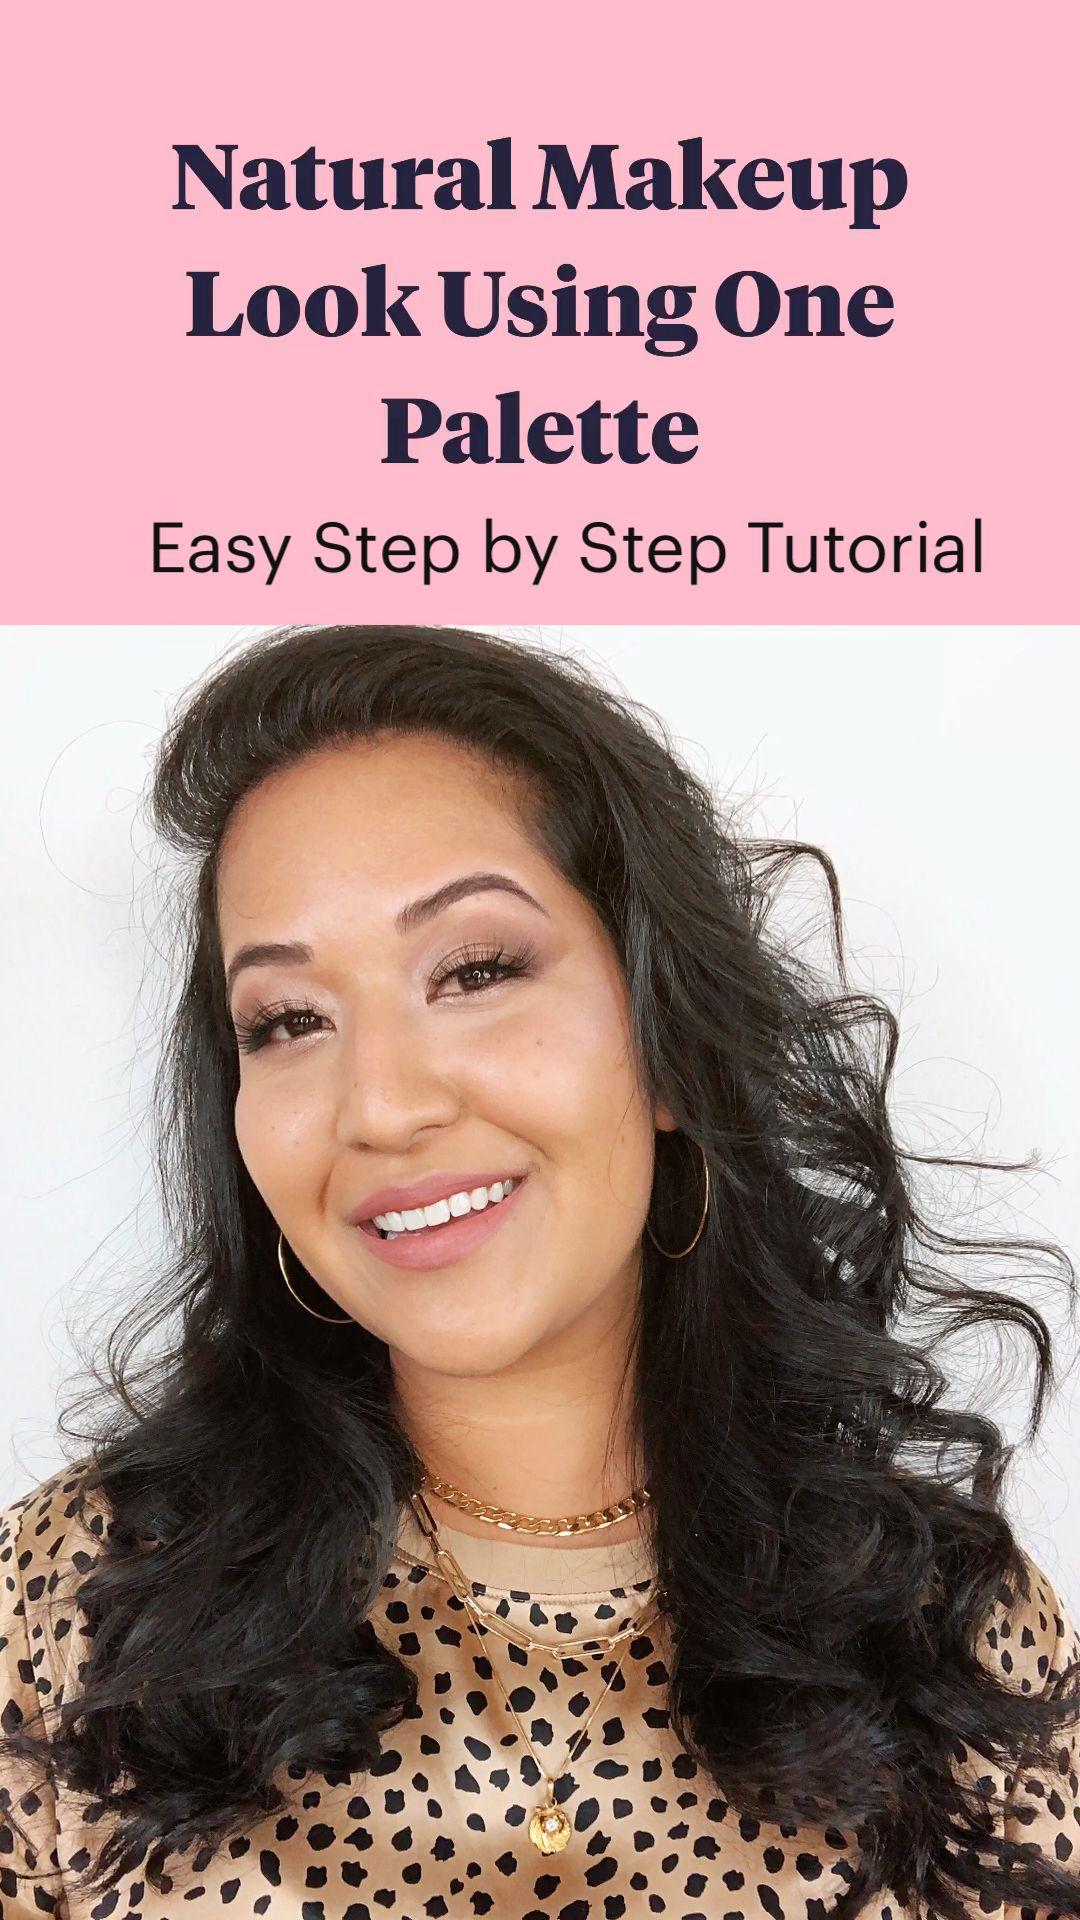 Easy Step by Step Tutorial